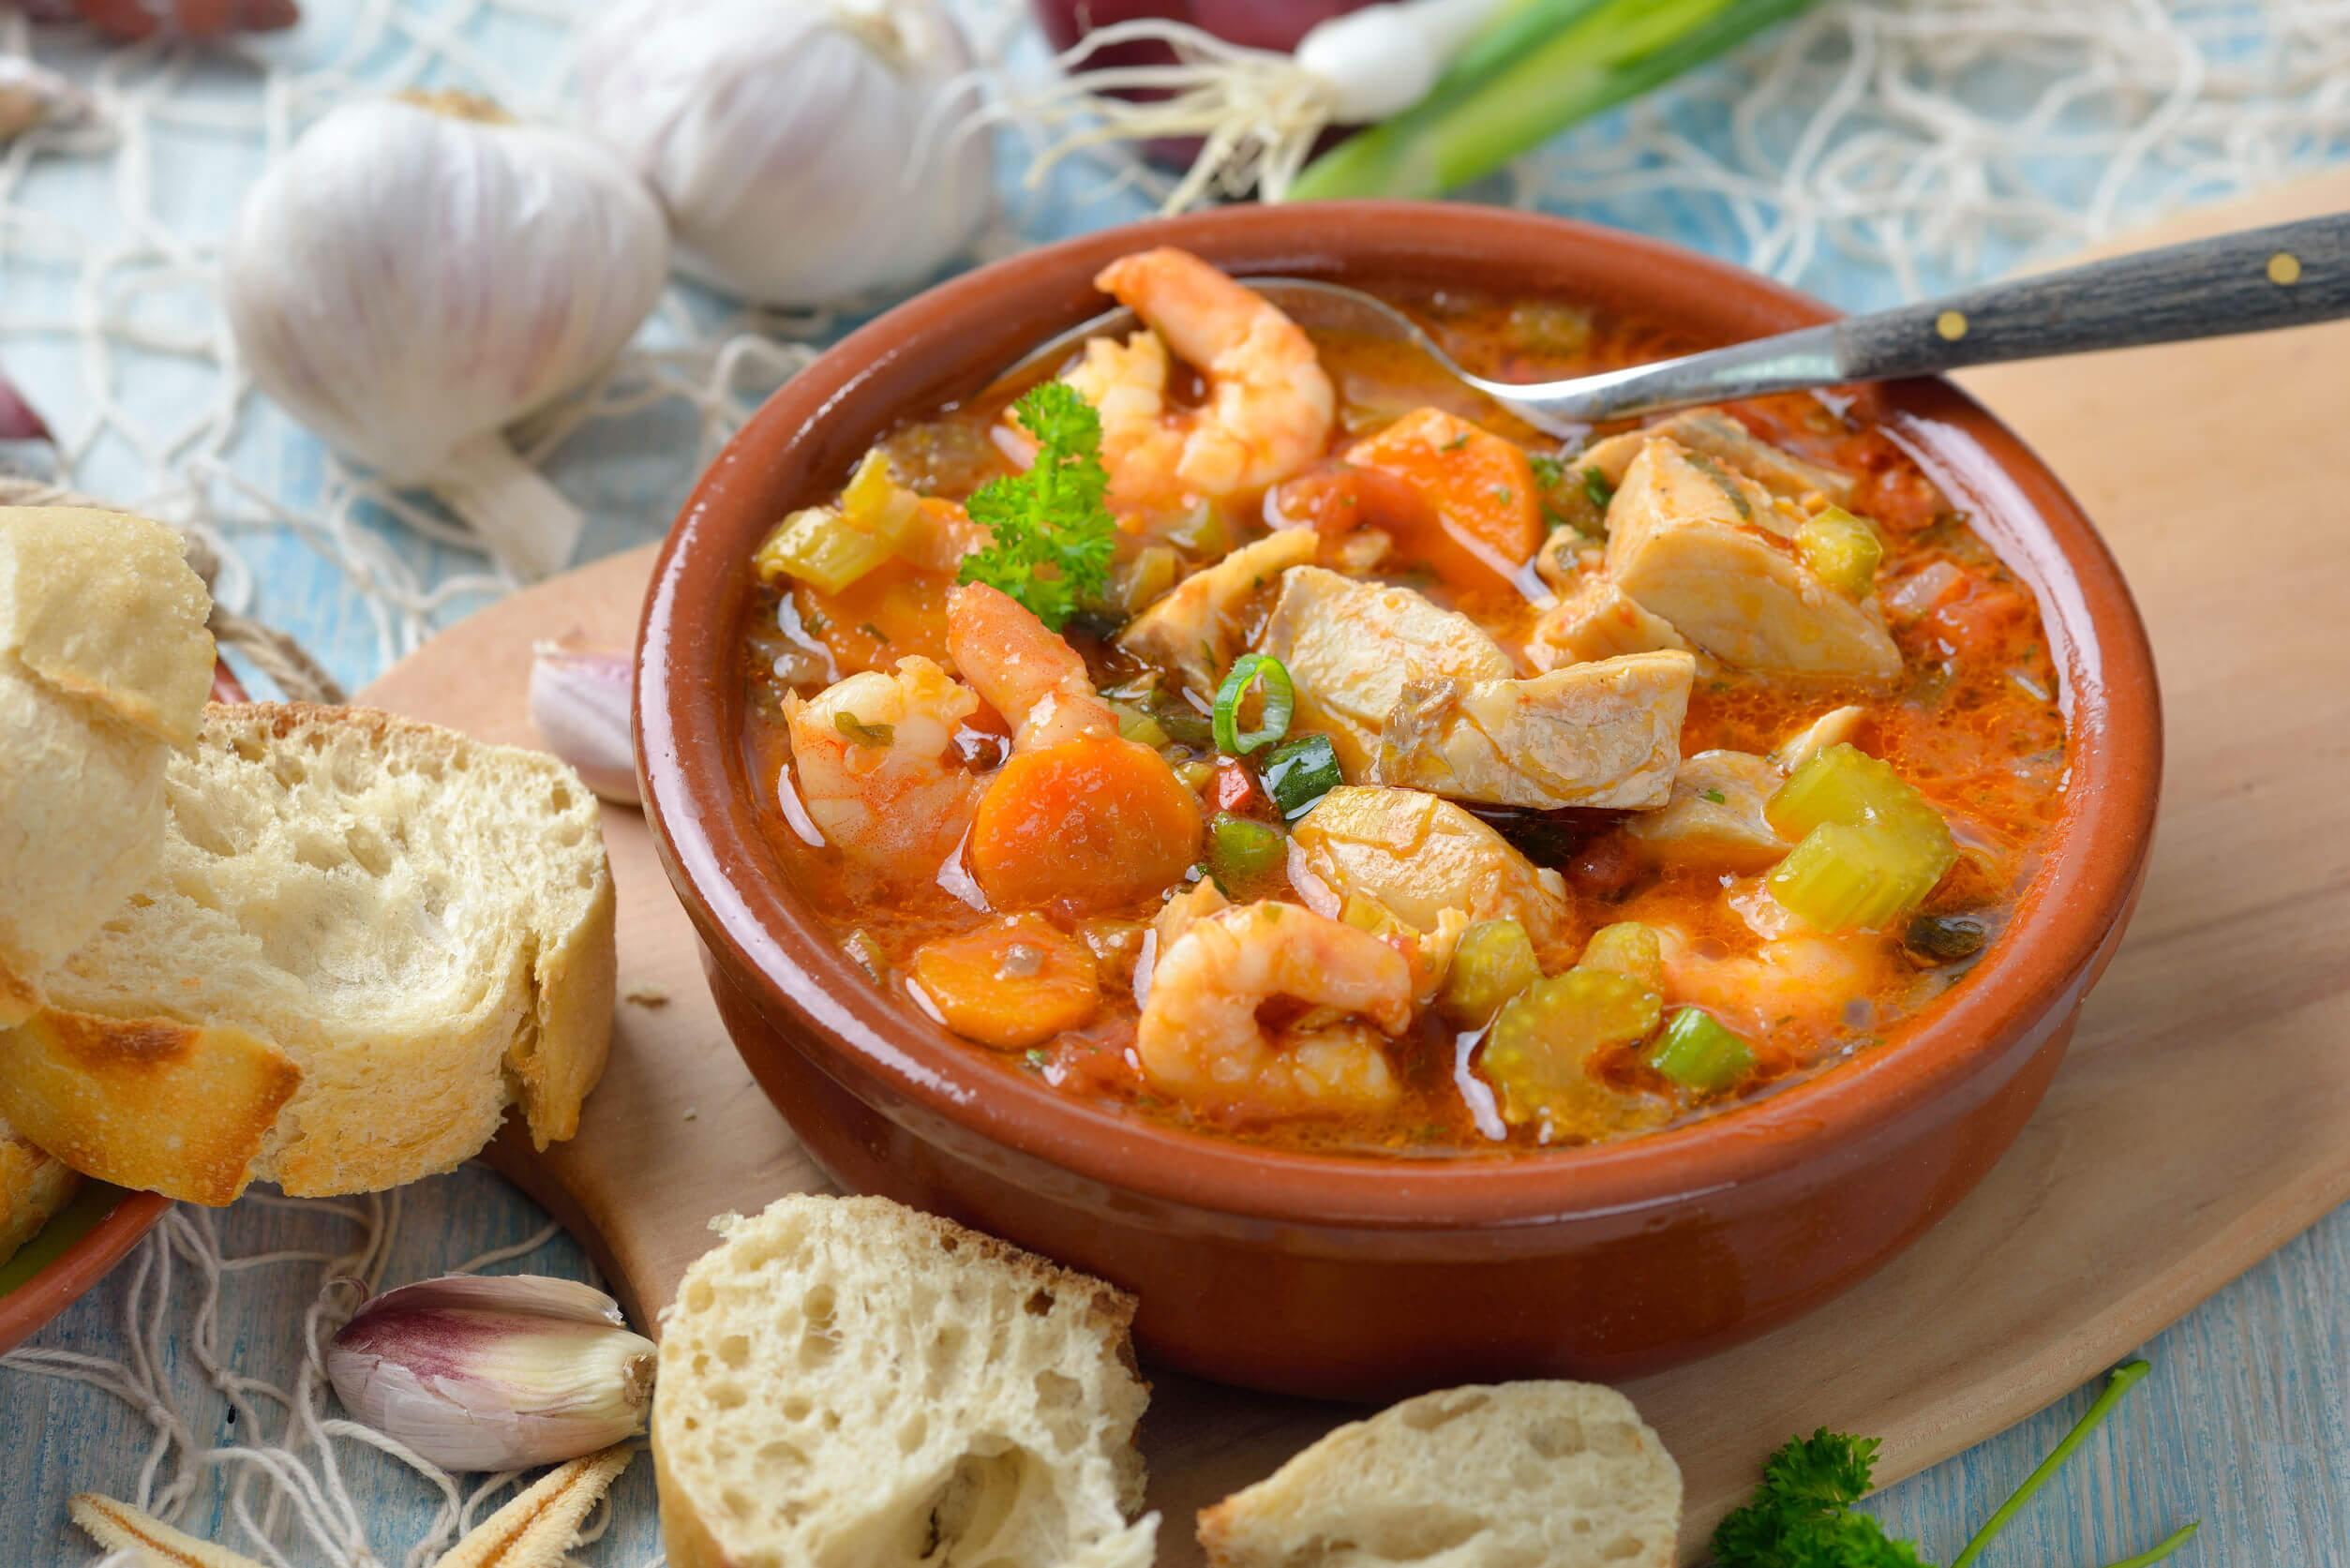 Las comidas calientes o frías tienen diferentes beneficios.